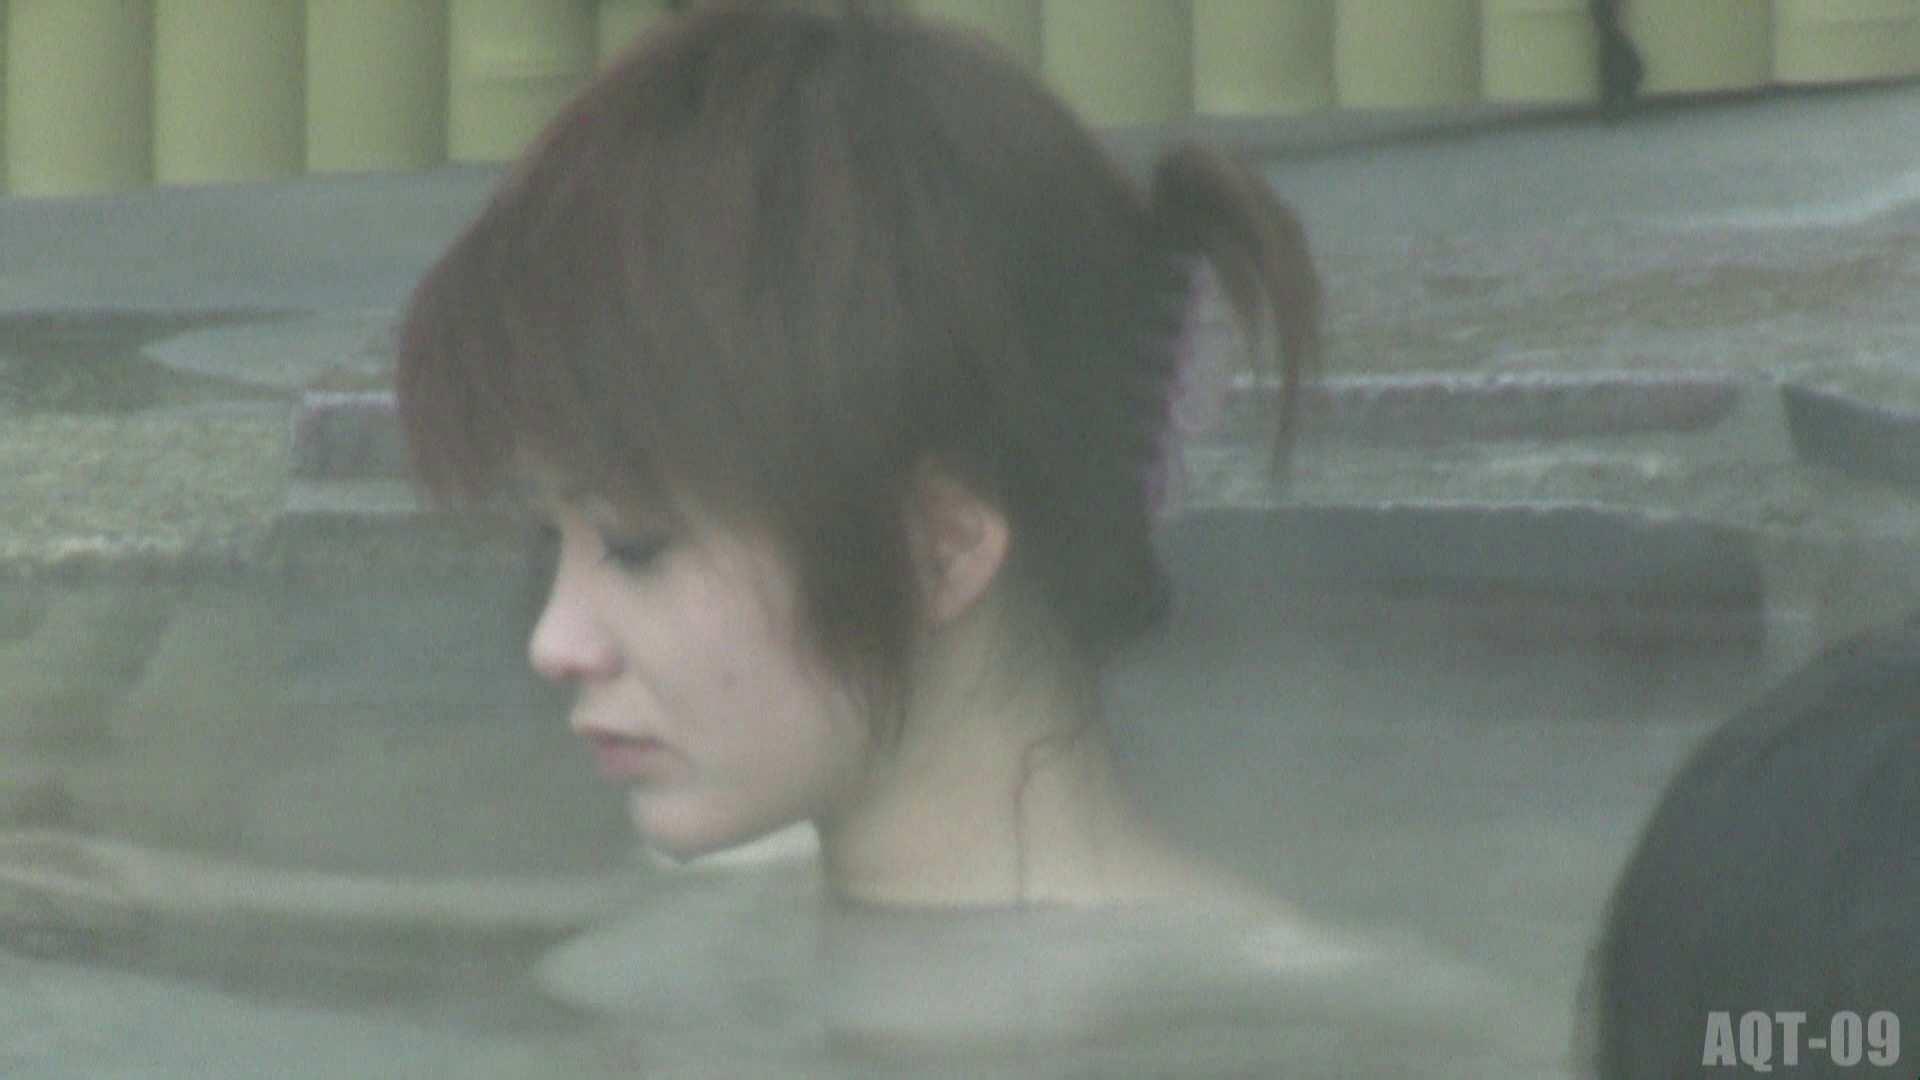 Aquaな露天風呂Vol.779 OLセックス 覗きおまんこ画像 107画像 32